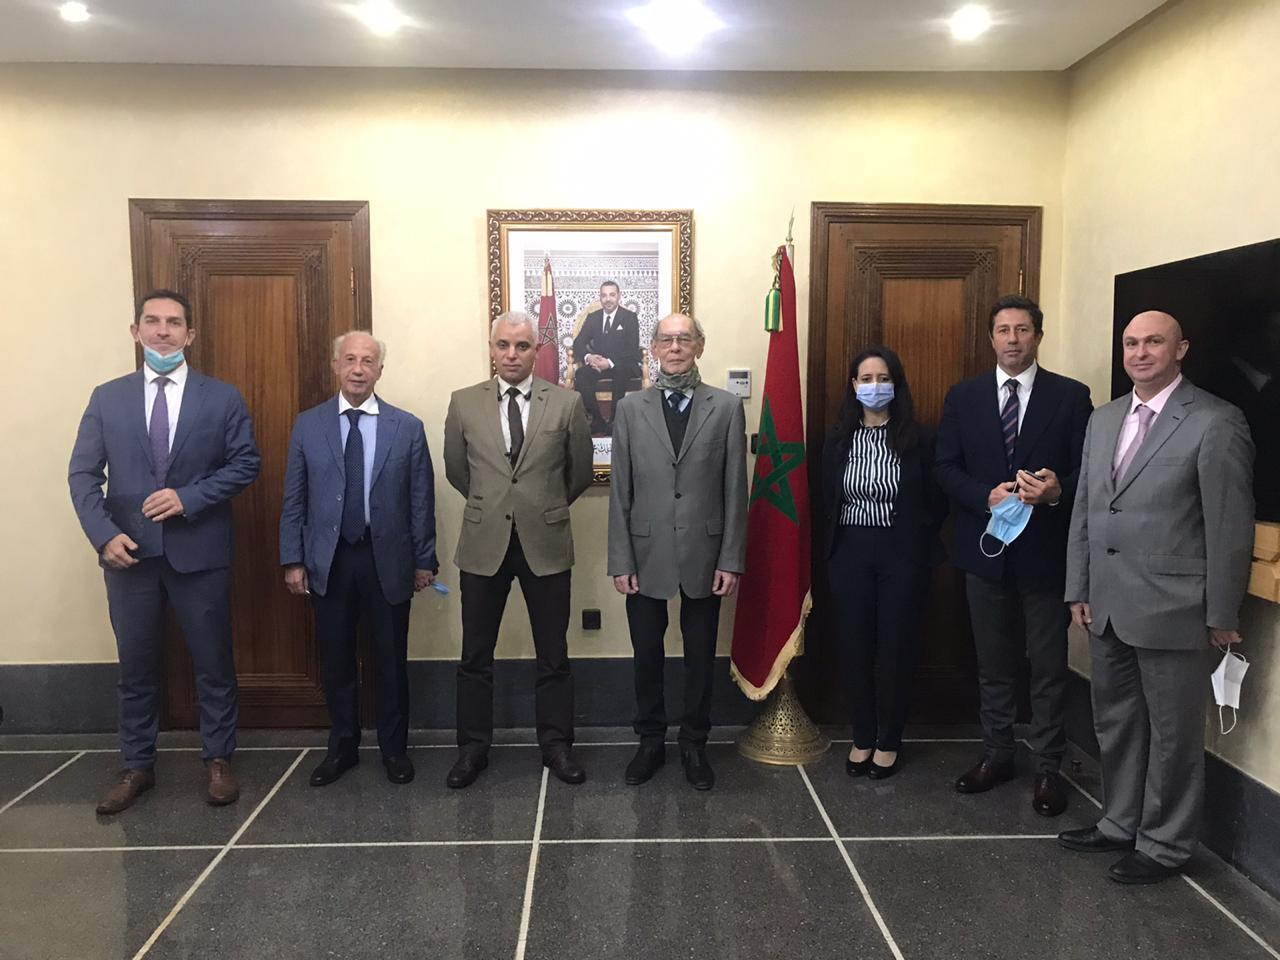 فيروس كورونا: اجتماع روسي مغربي حول لقاح سبوتنيك V